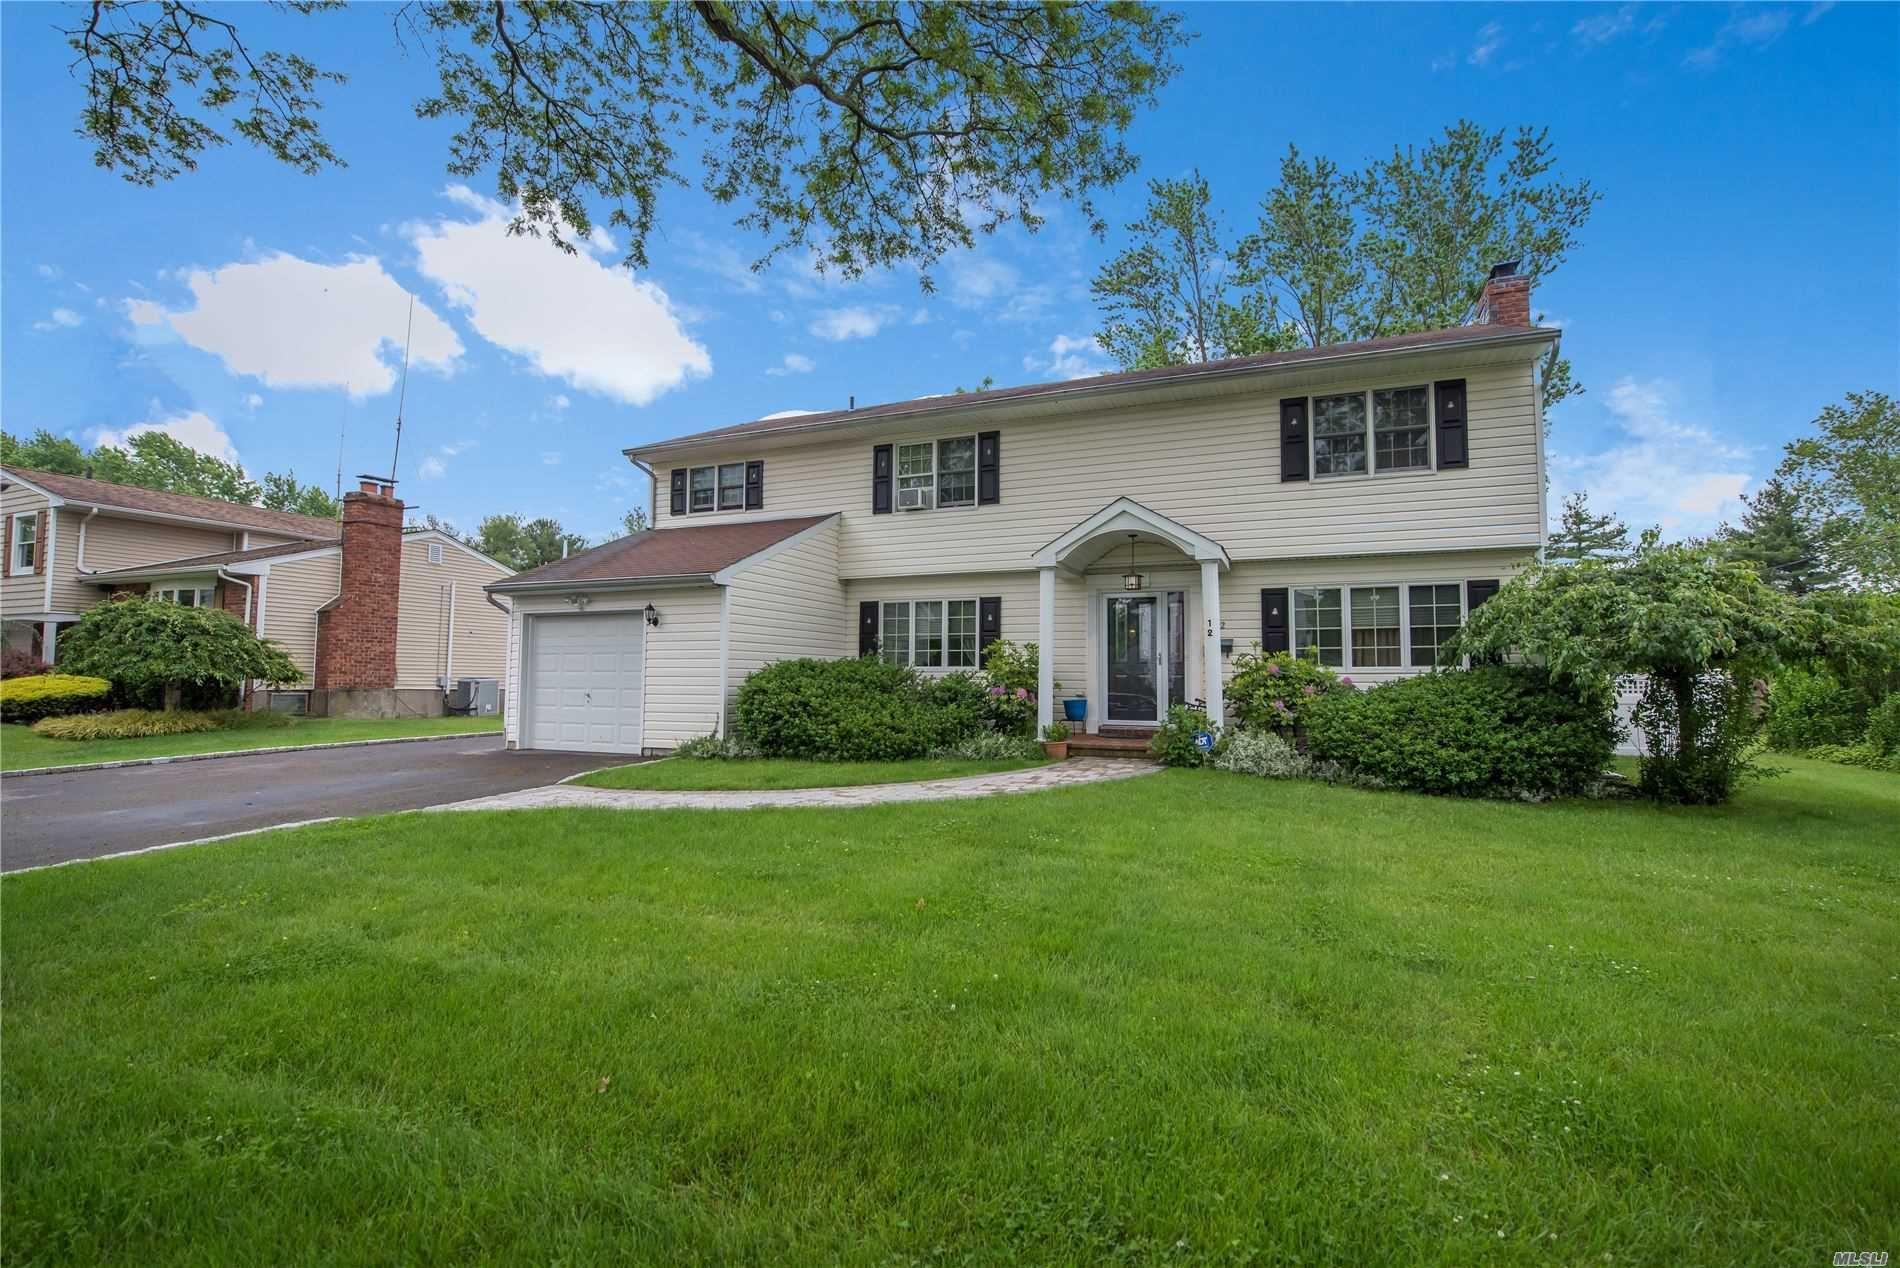 12 Elderwood Lane, Melville, NY 11747 - MLS#: 3216912